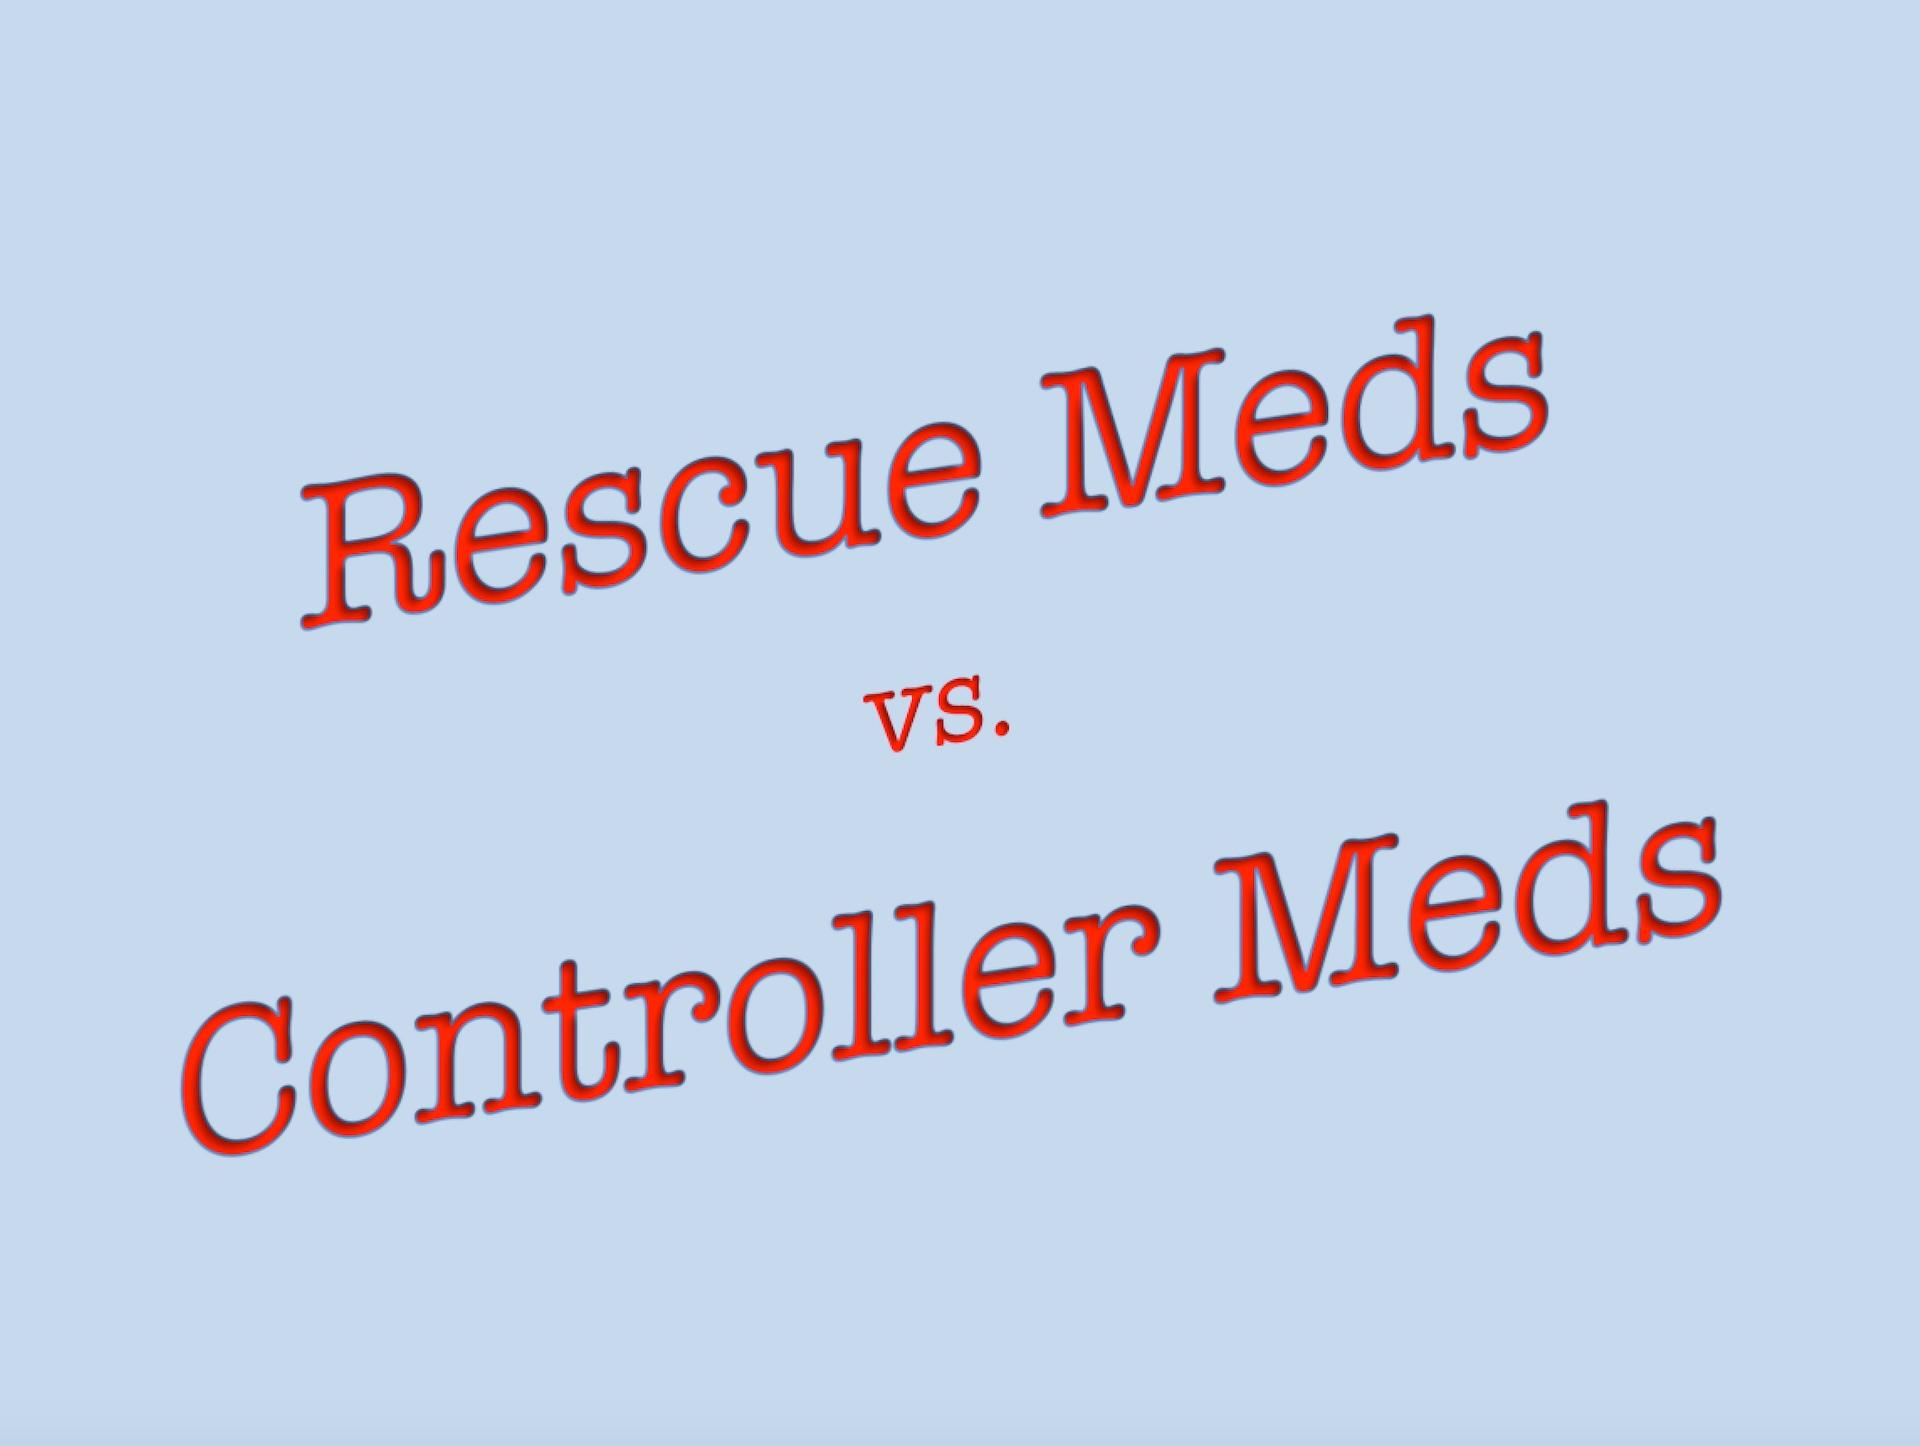 Rescue vs. Controller Meds